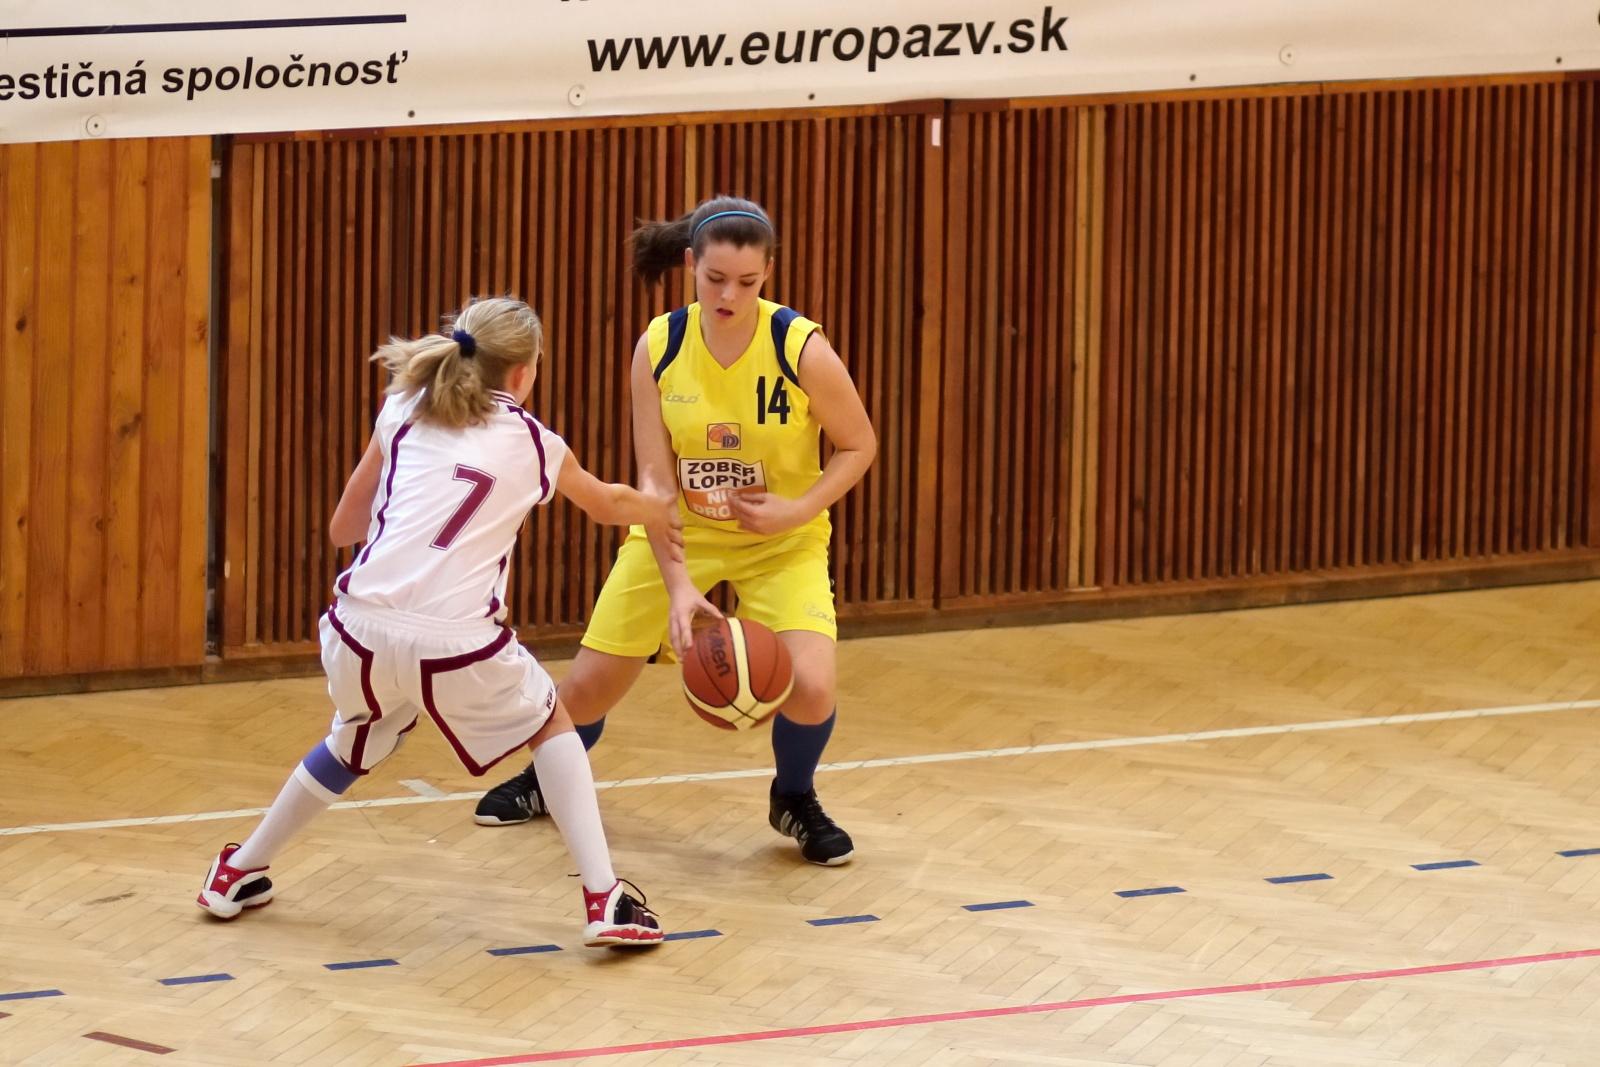 bk-zvolen-tydam-kosice-ziacky-basketbal-2011-12